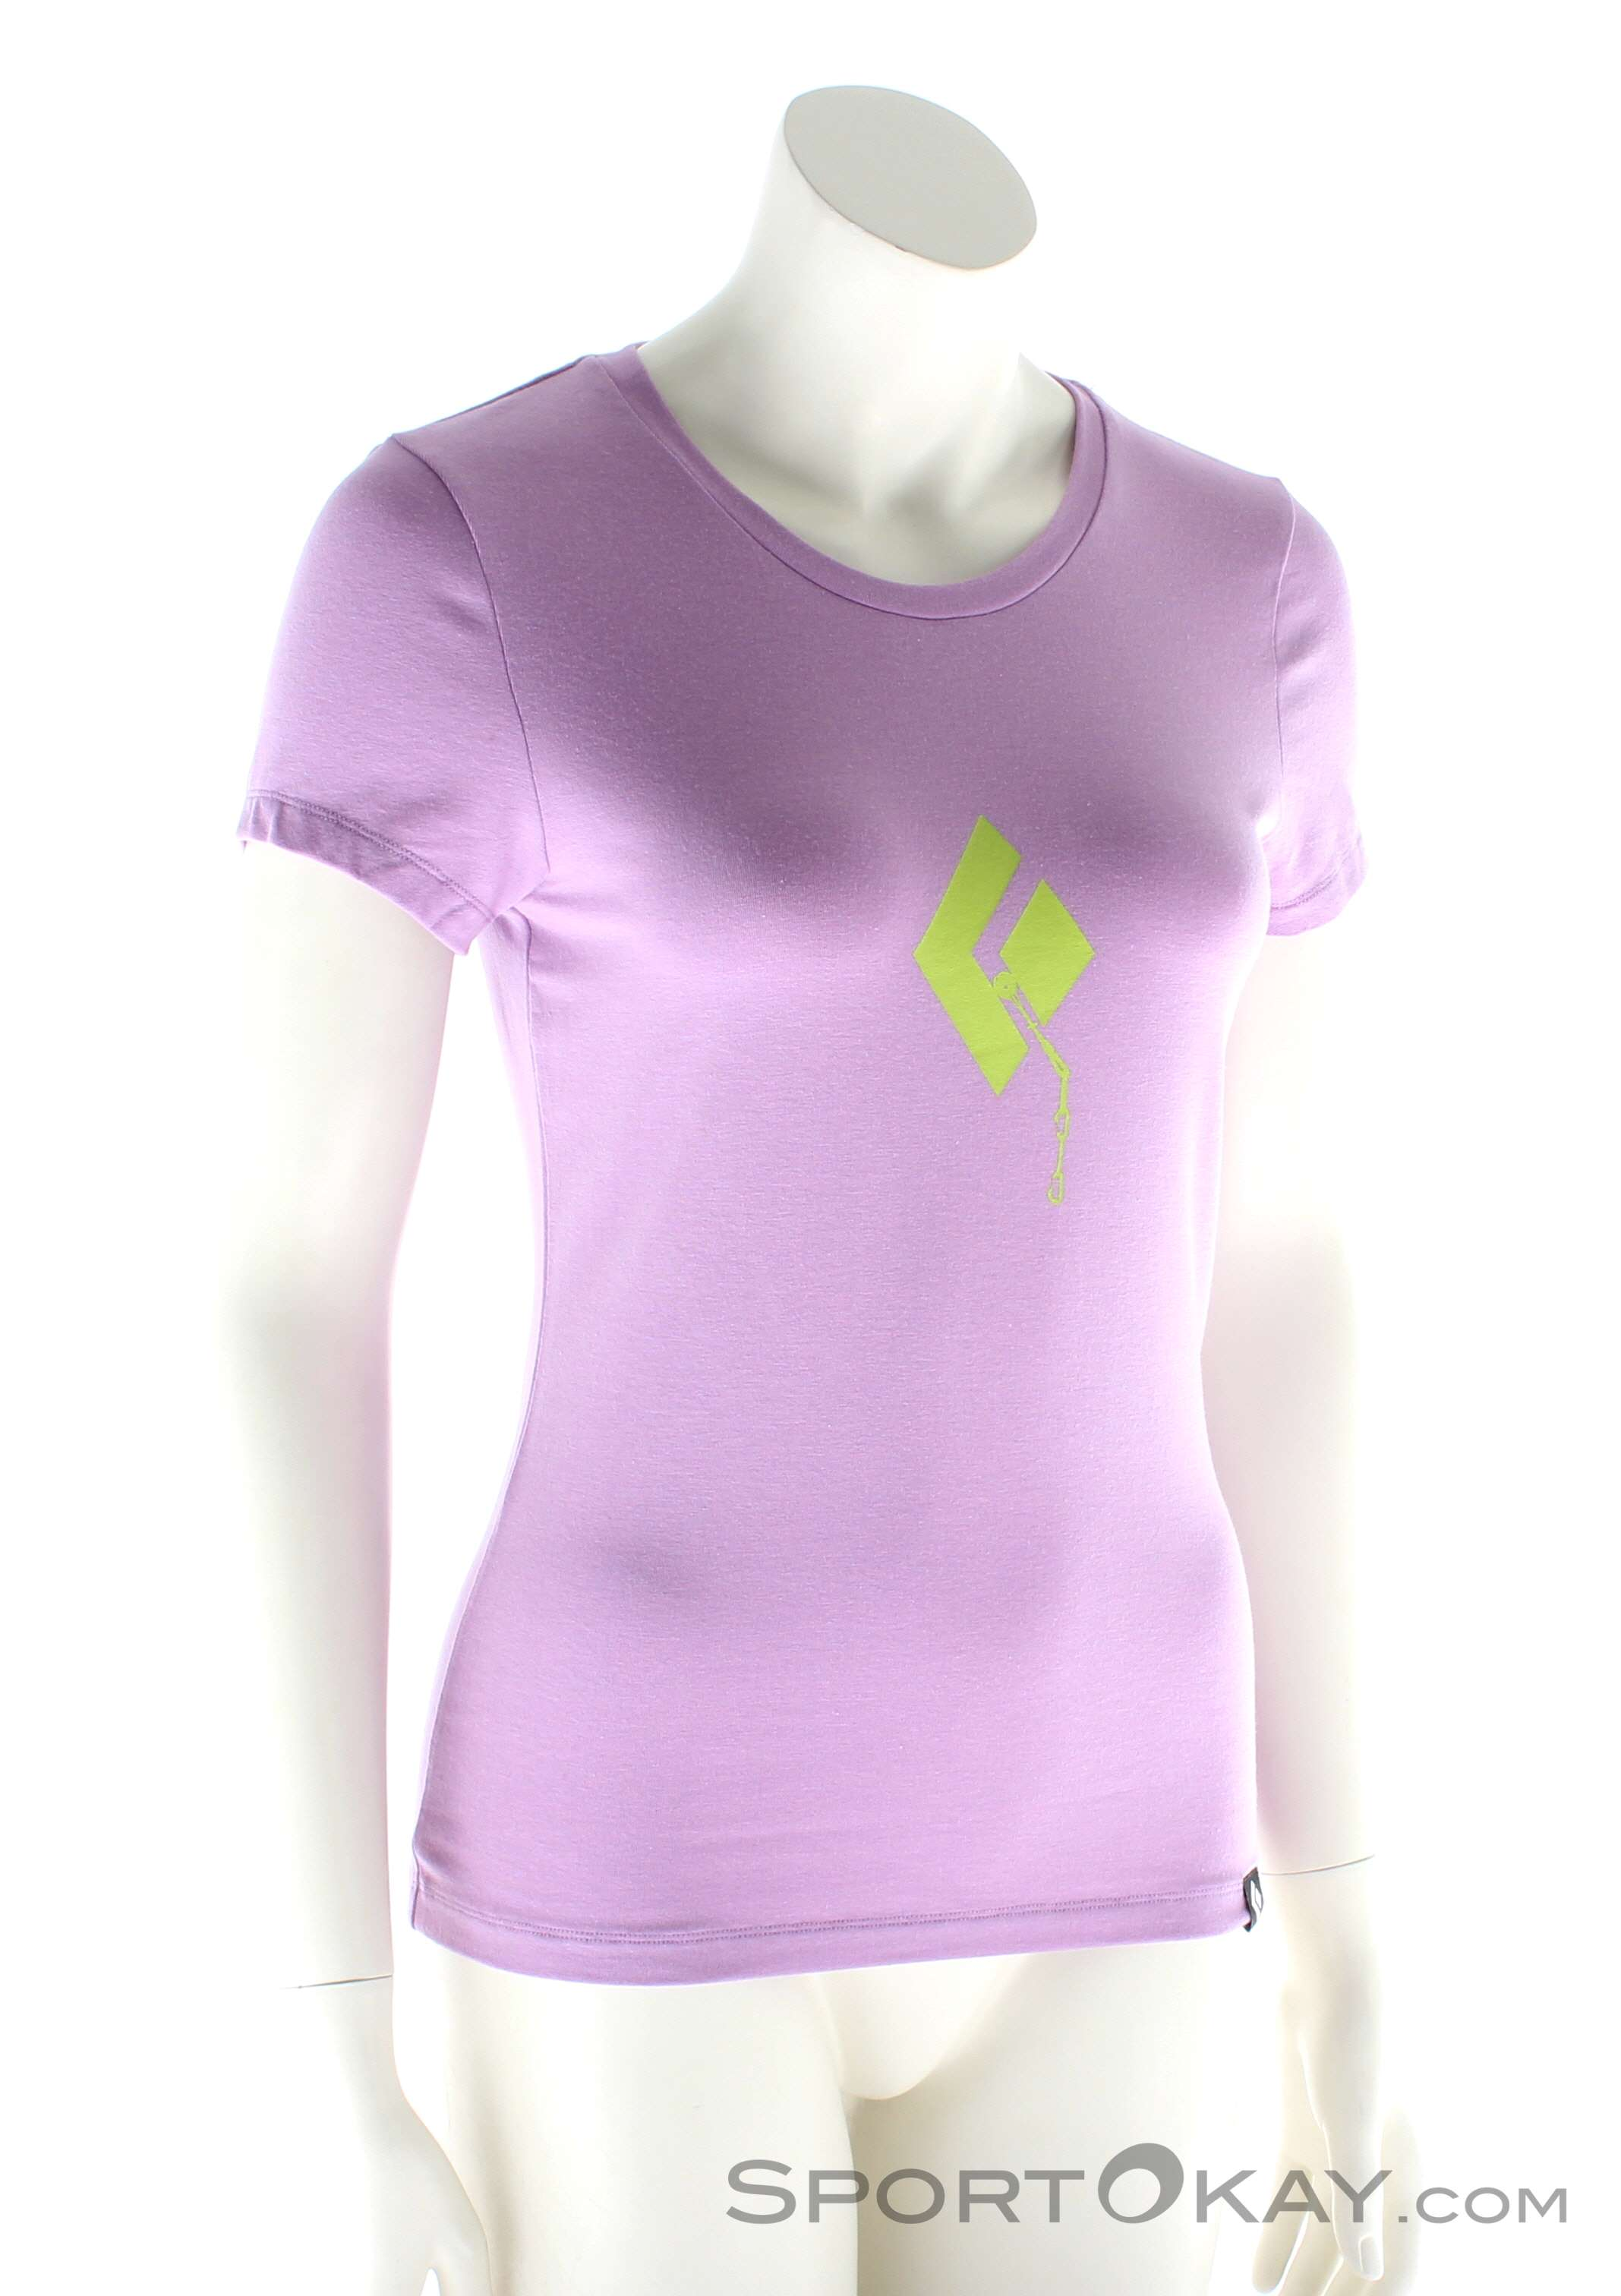 Black Diamond Placement SS Damen T-Shirt, Black Diamond, Lila, , Damen, 0056-10421, 5637497481, 793661292609, N1-01.jpg